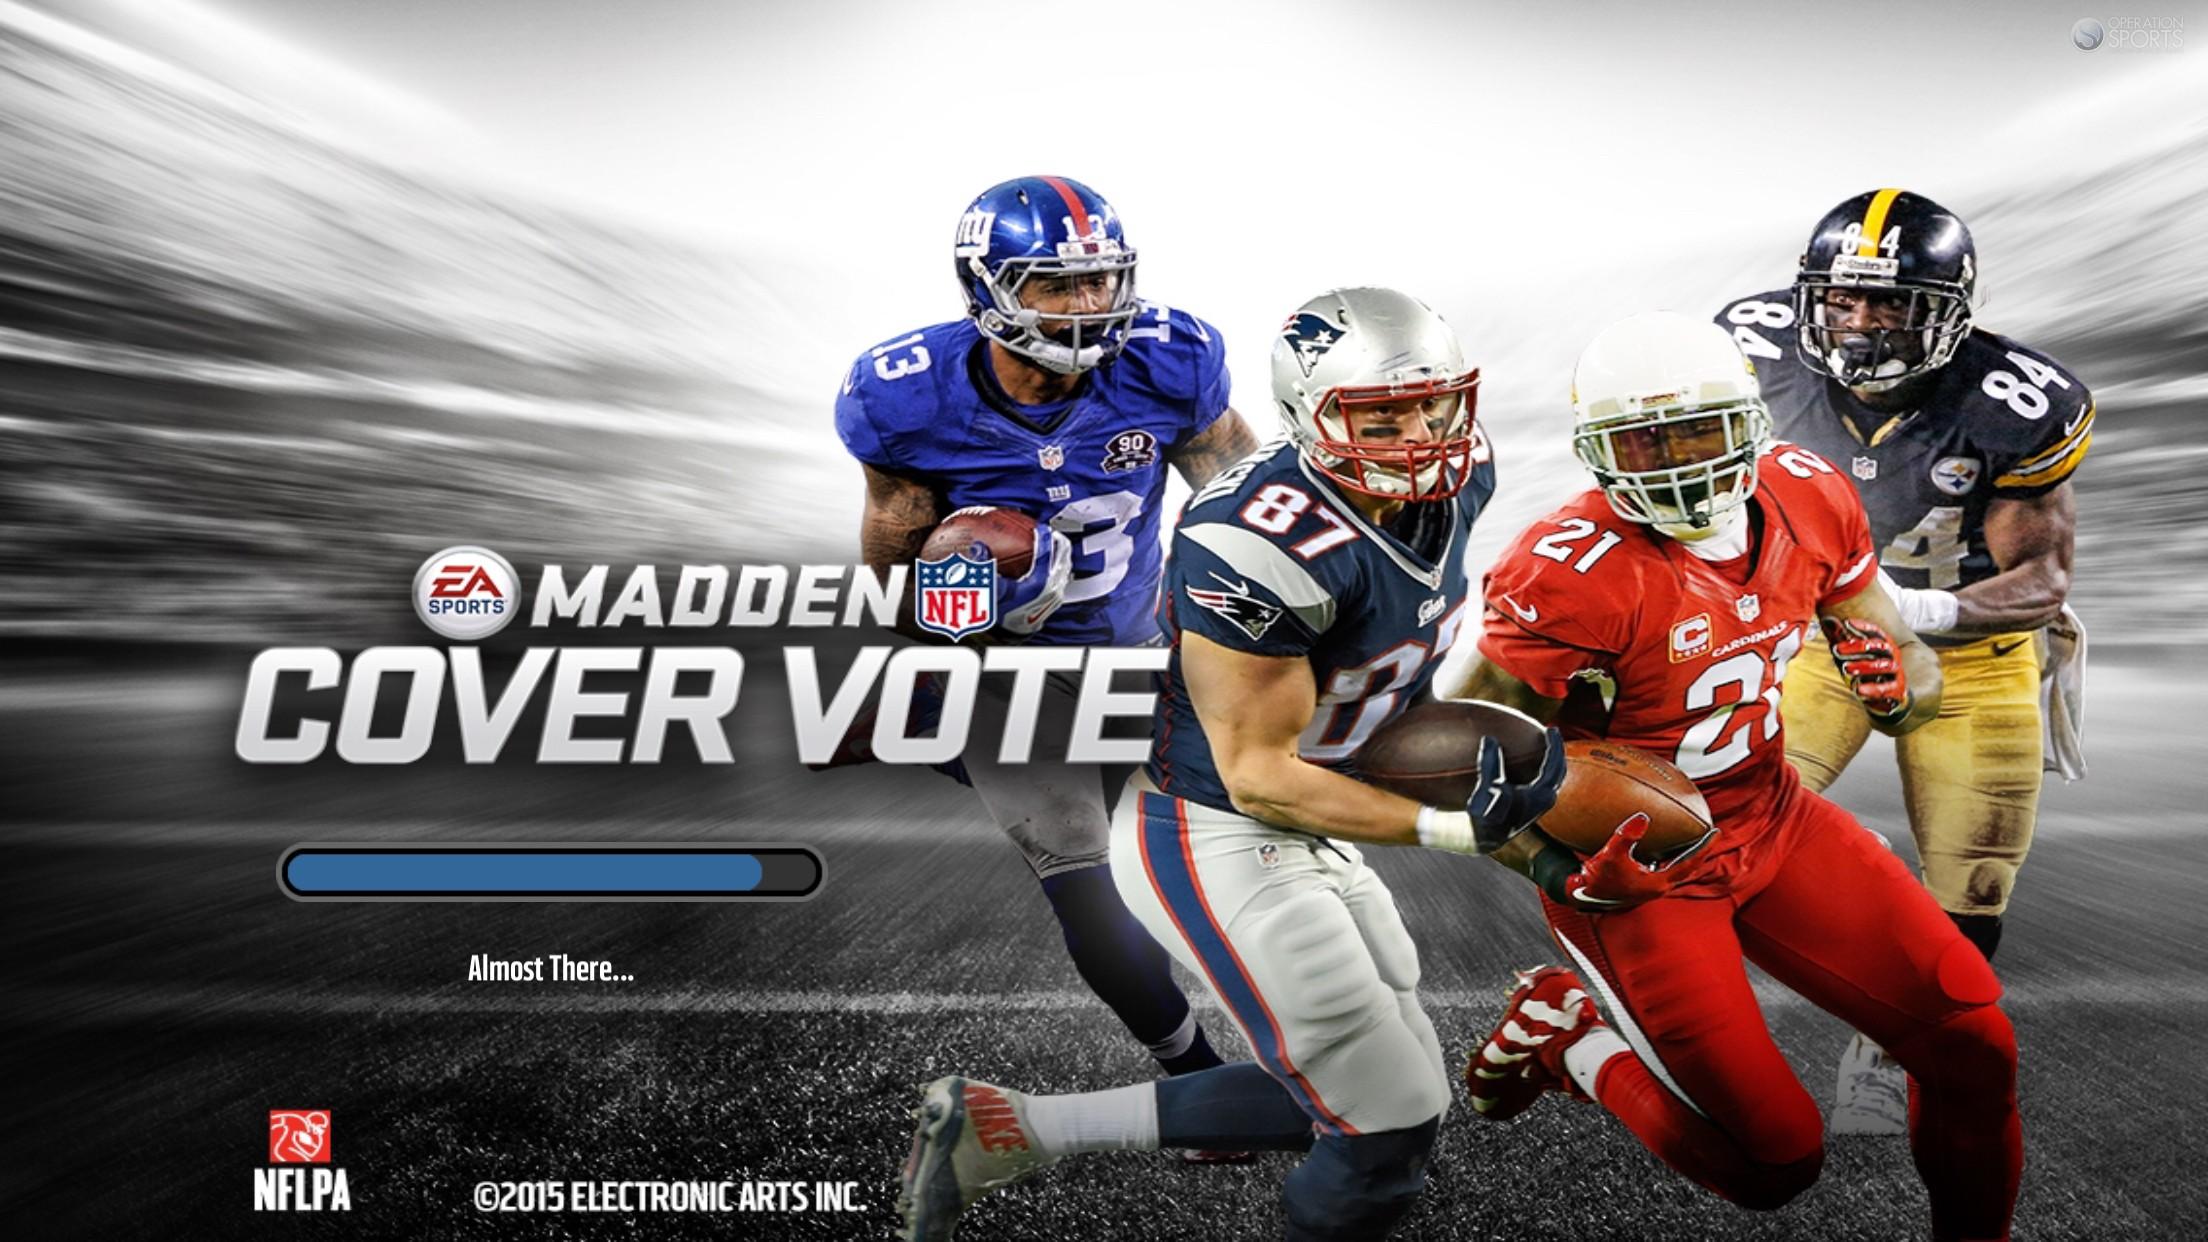 Madden NFL 17 Xbox Digital